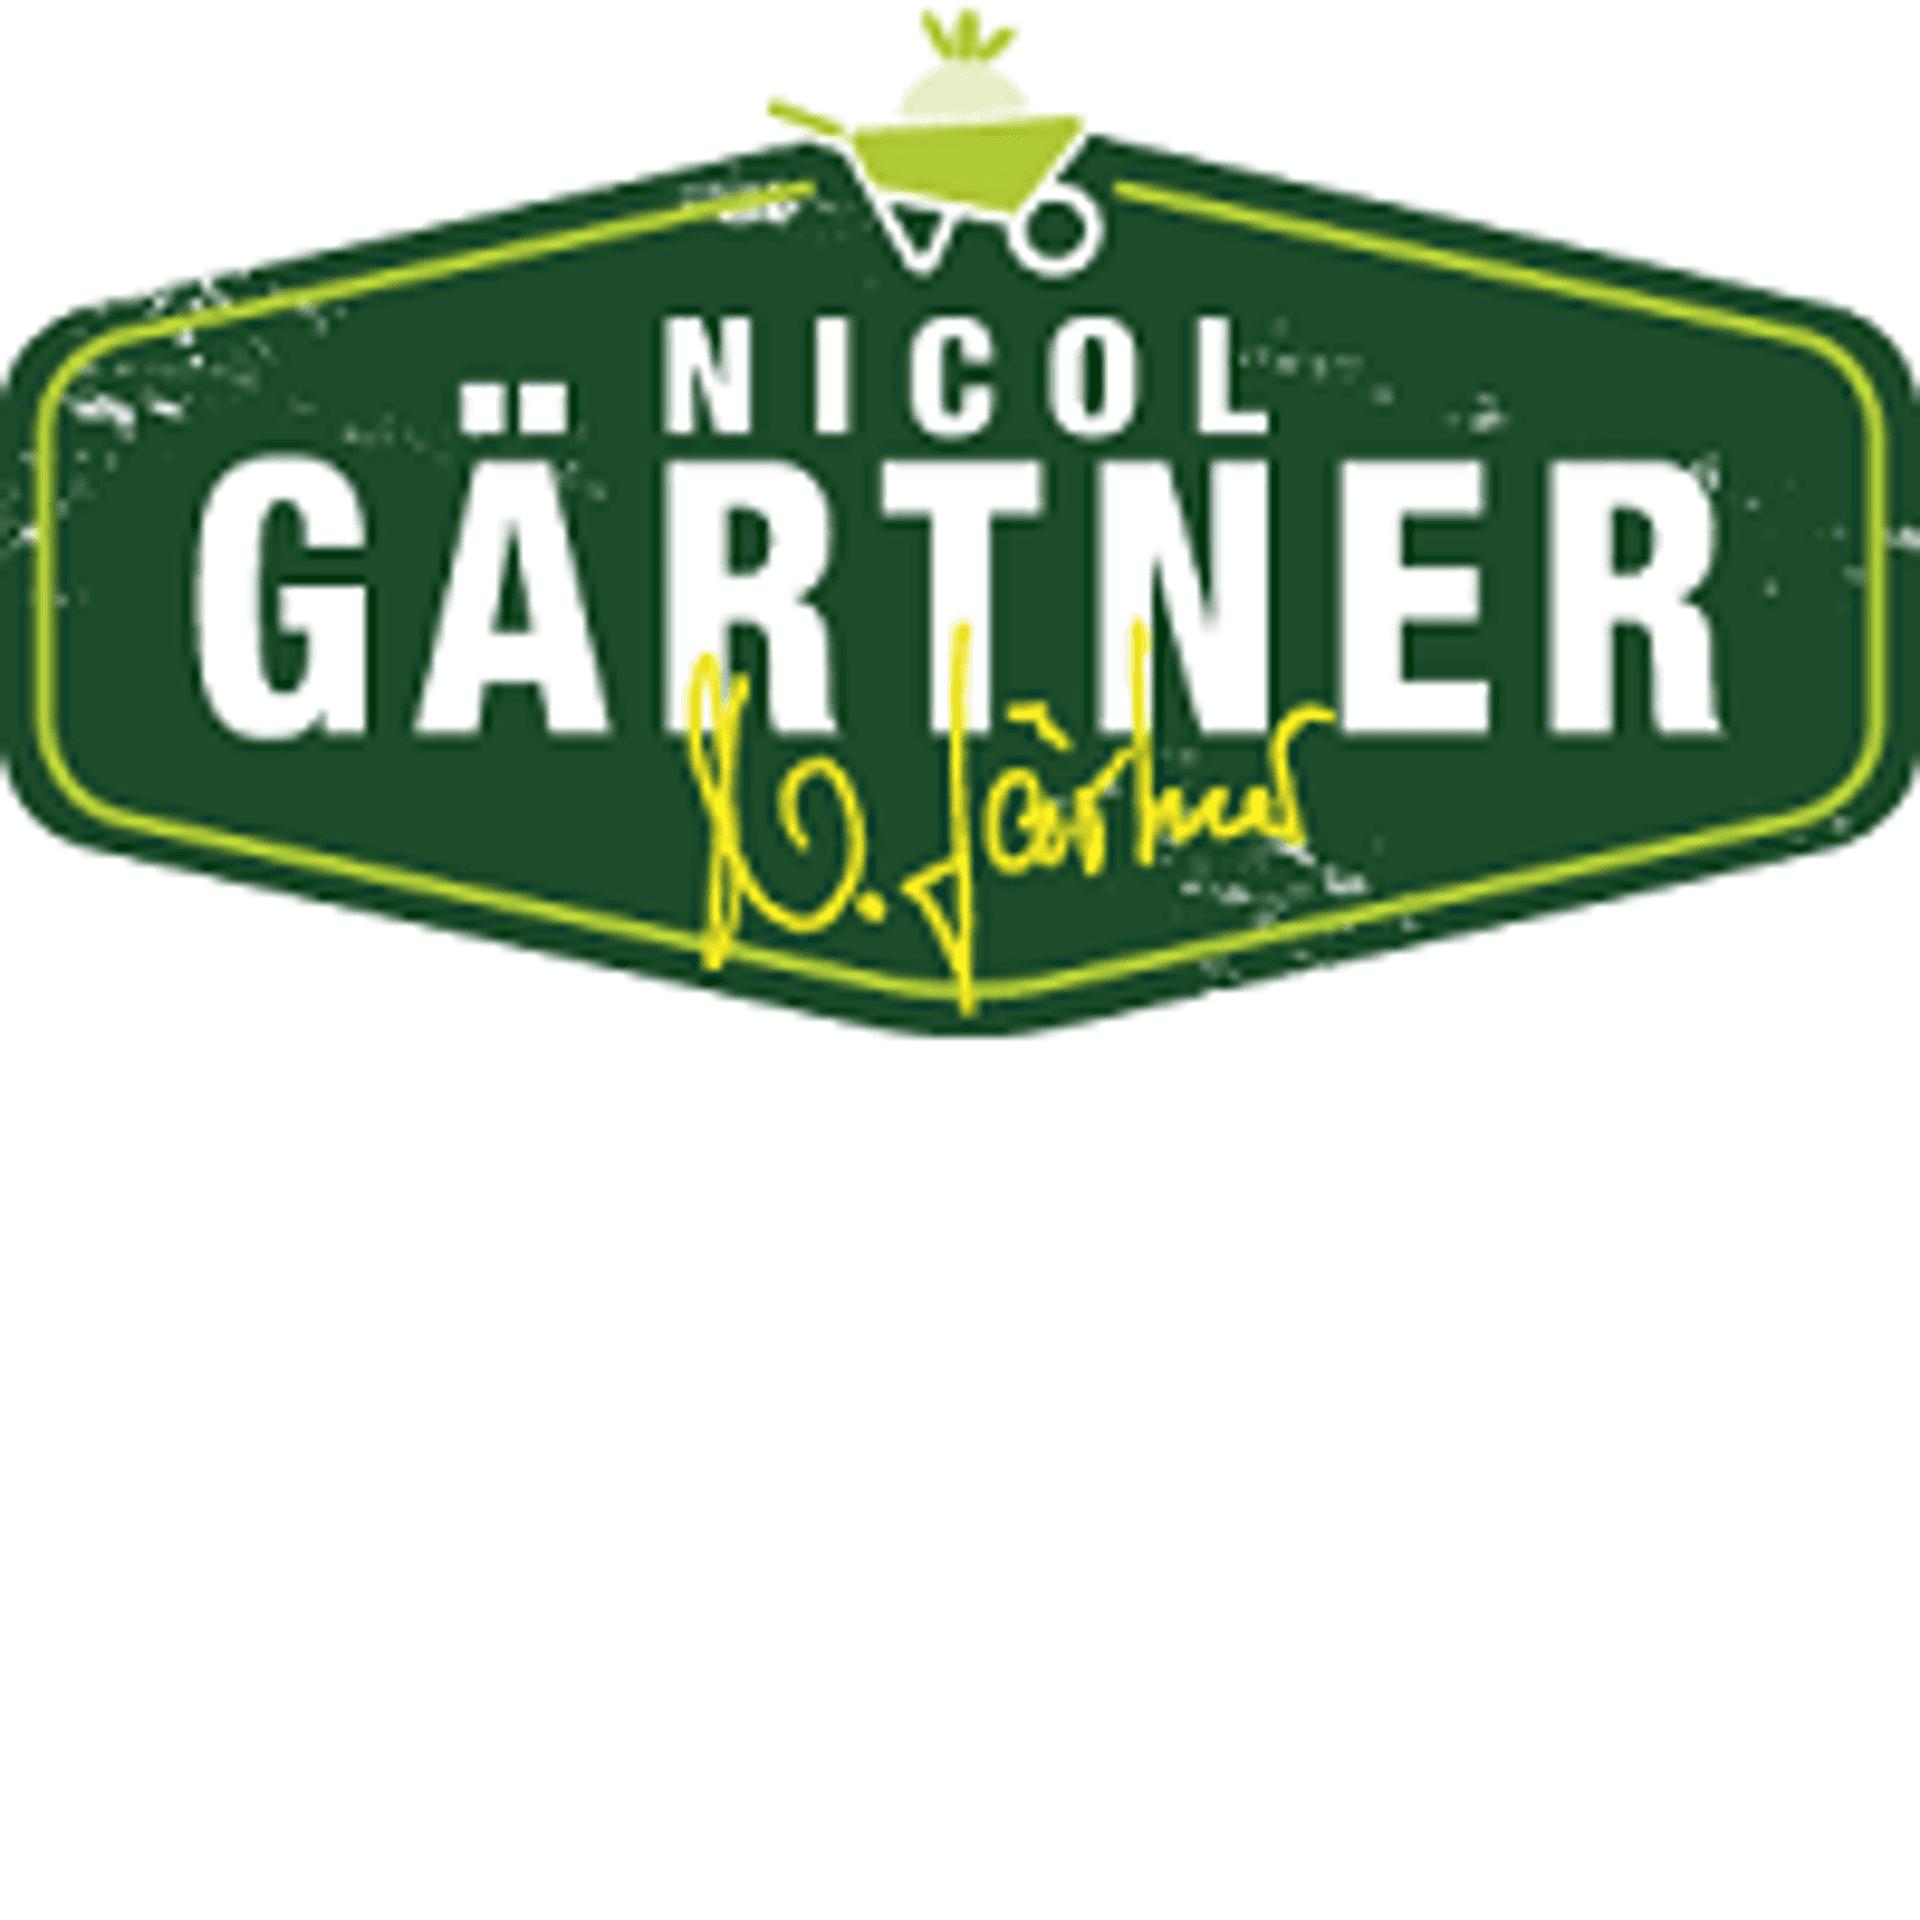 Nicol gaertner